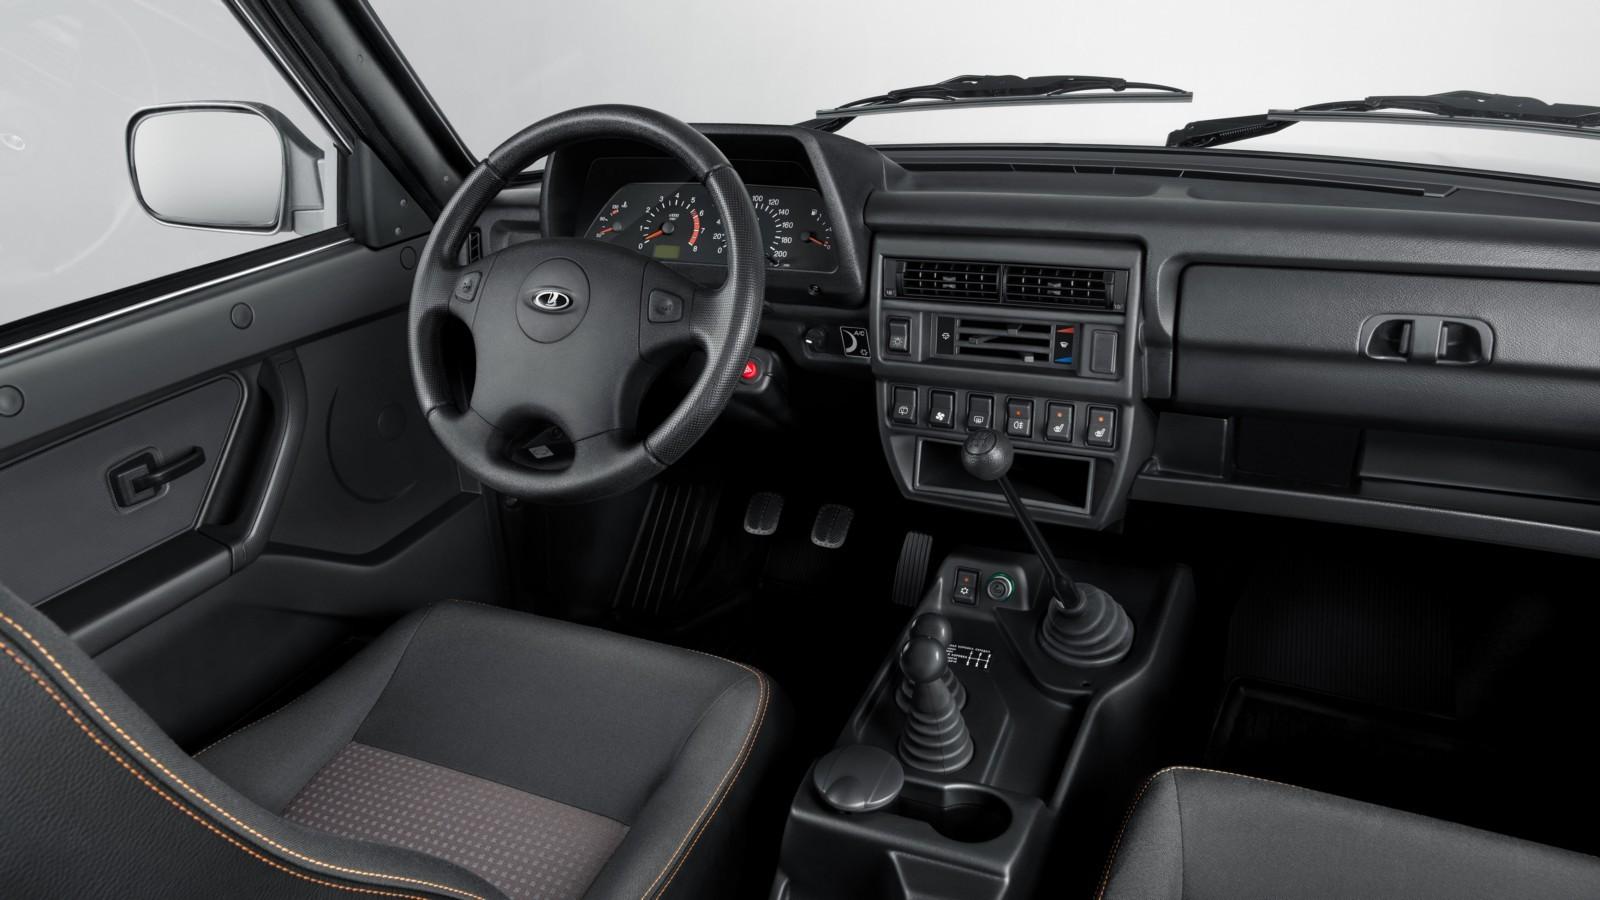 Lada 4x4 Urban